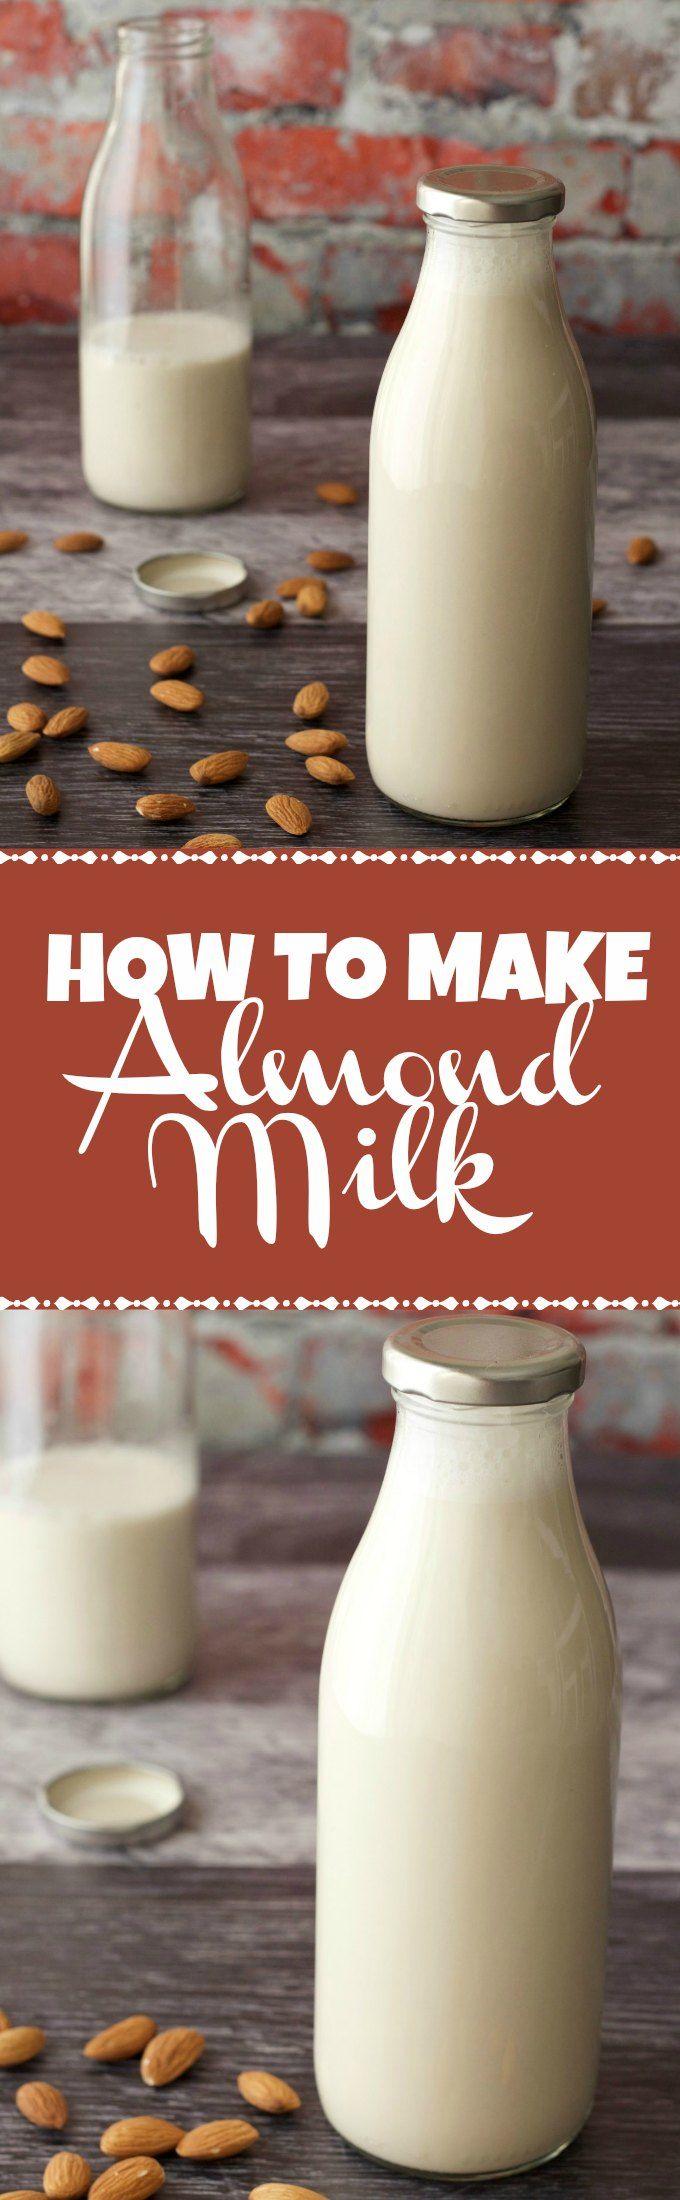 How To Make Almond Milk. Vegan and Gluten-Free. Vegan Recipes   Vegan Breakfast   Vegan Food   Gluten-Free Vegan